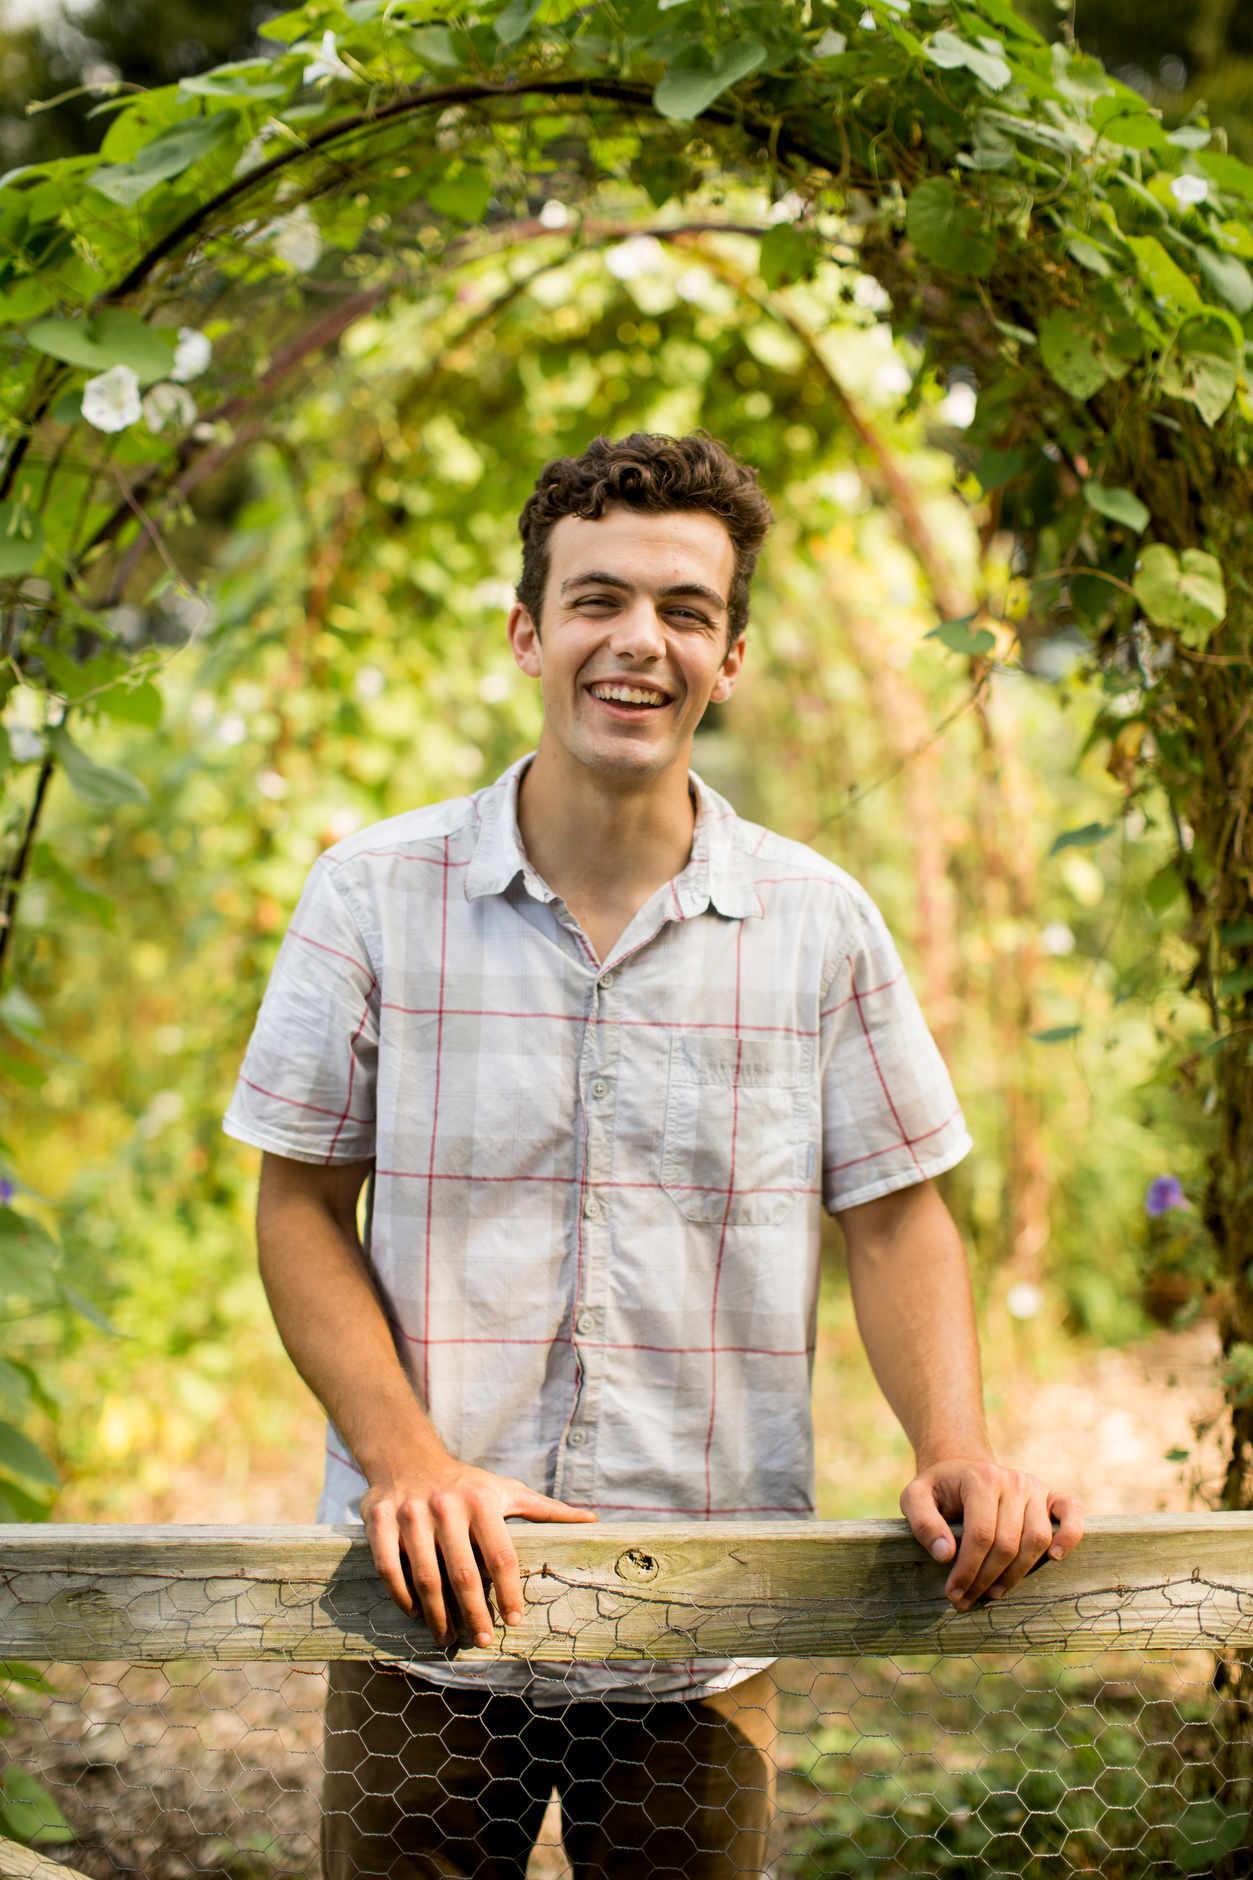 Indiana University student Corben Andrews – Bloomington, Indiana – Sept. 14, 2016. (Photo by James Brosher)